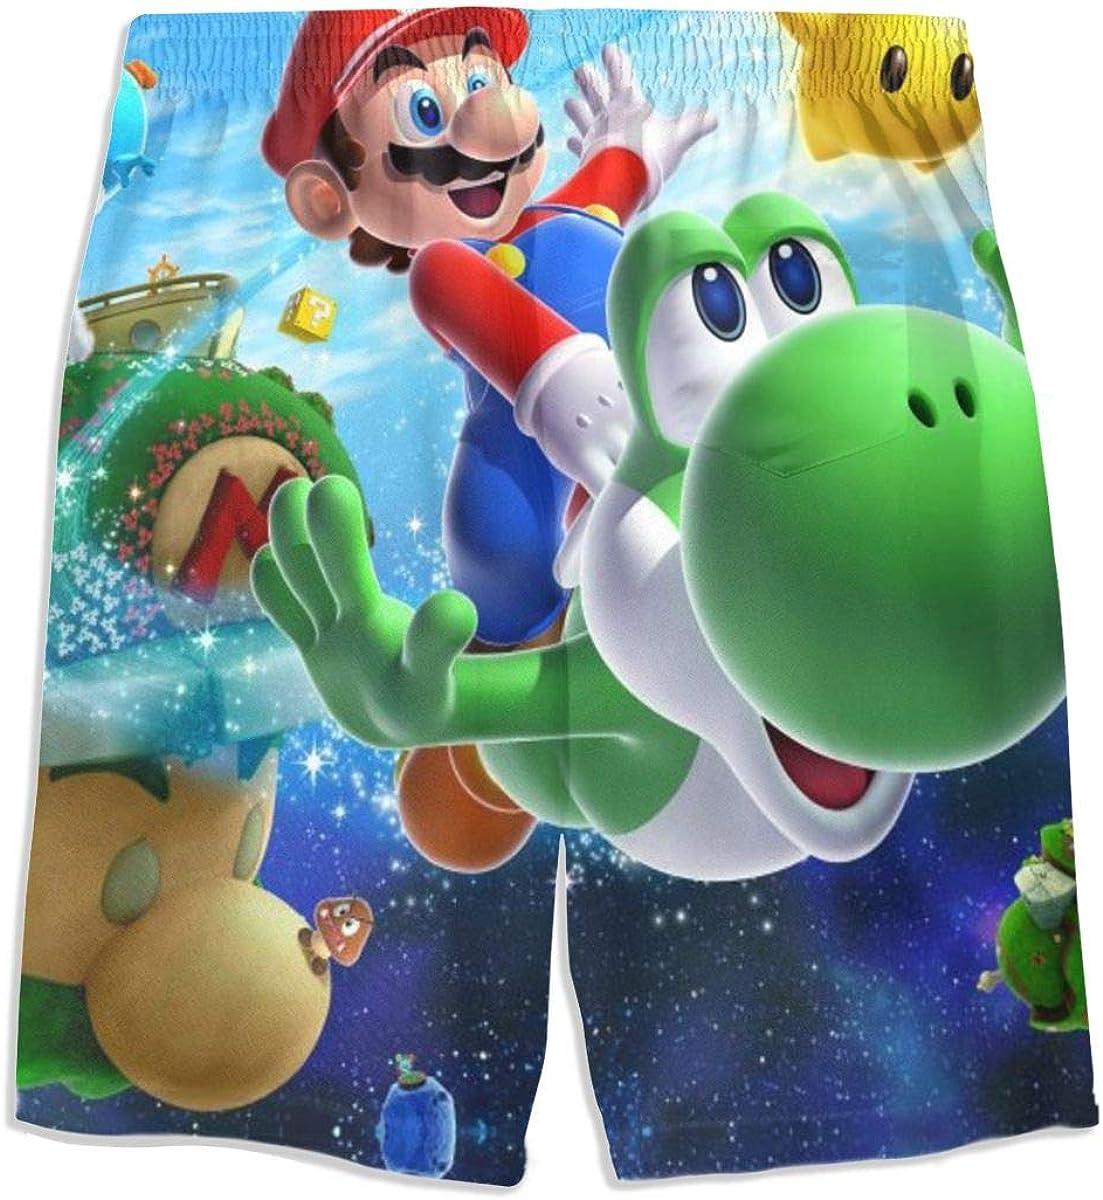 AndeyTT Super Mario Galaxy Boys Teens Cool Swimtrunks Quick Dry 3D Printed Casual Beach Boardshorts 7-20 Years